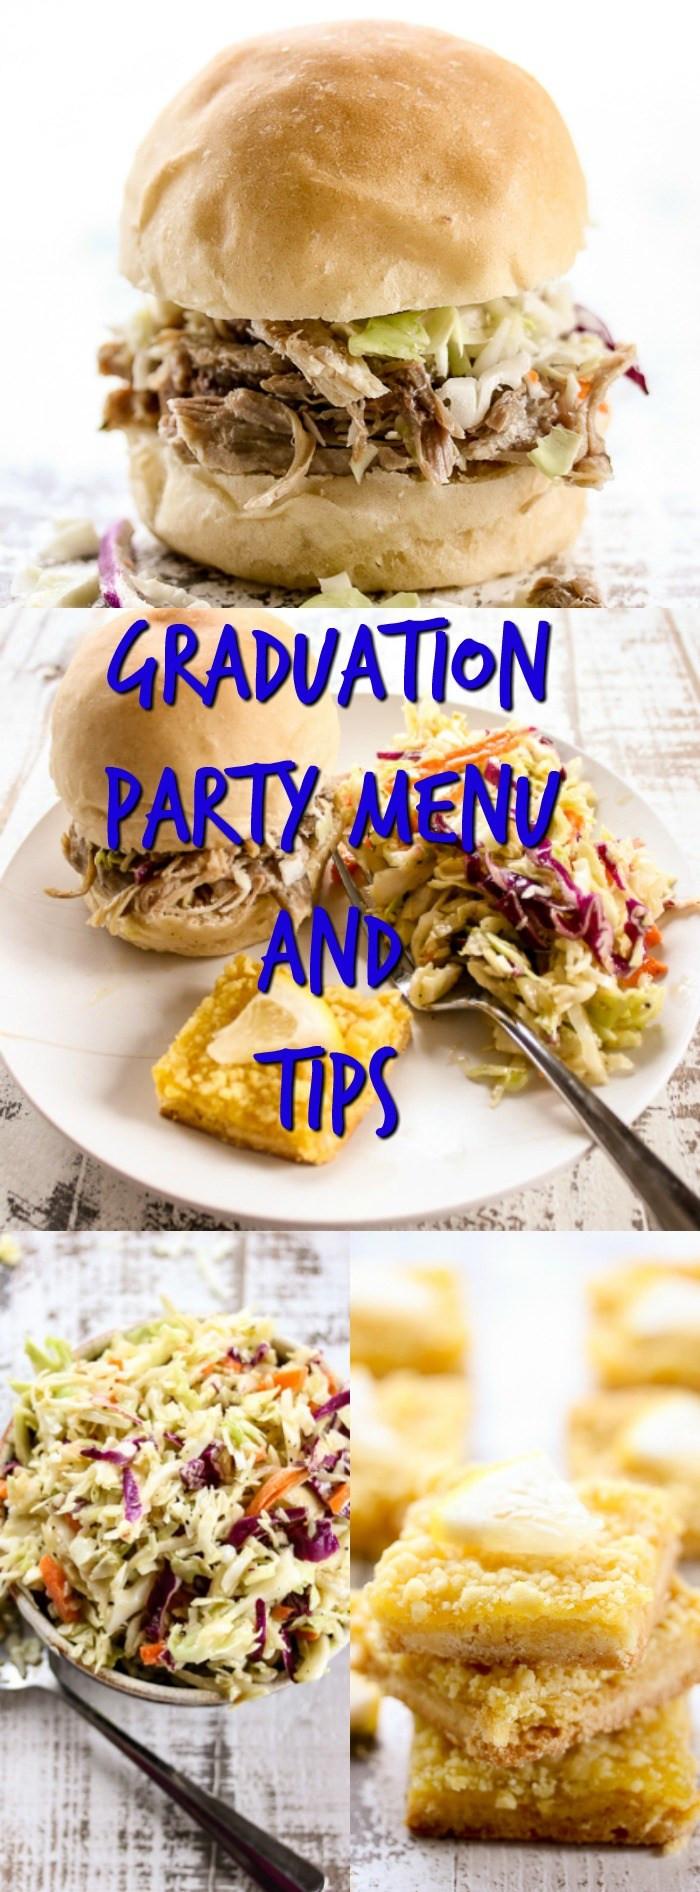 Graduation Party Menu Ideas  Graduation Party Menu and Tips Lisa s Dinnertime Dish